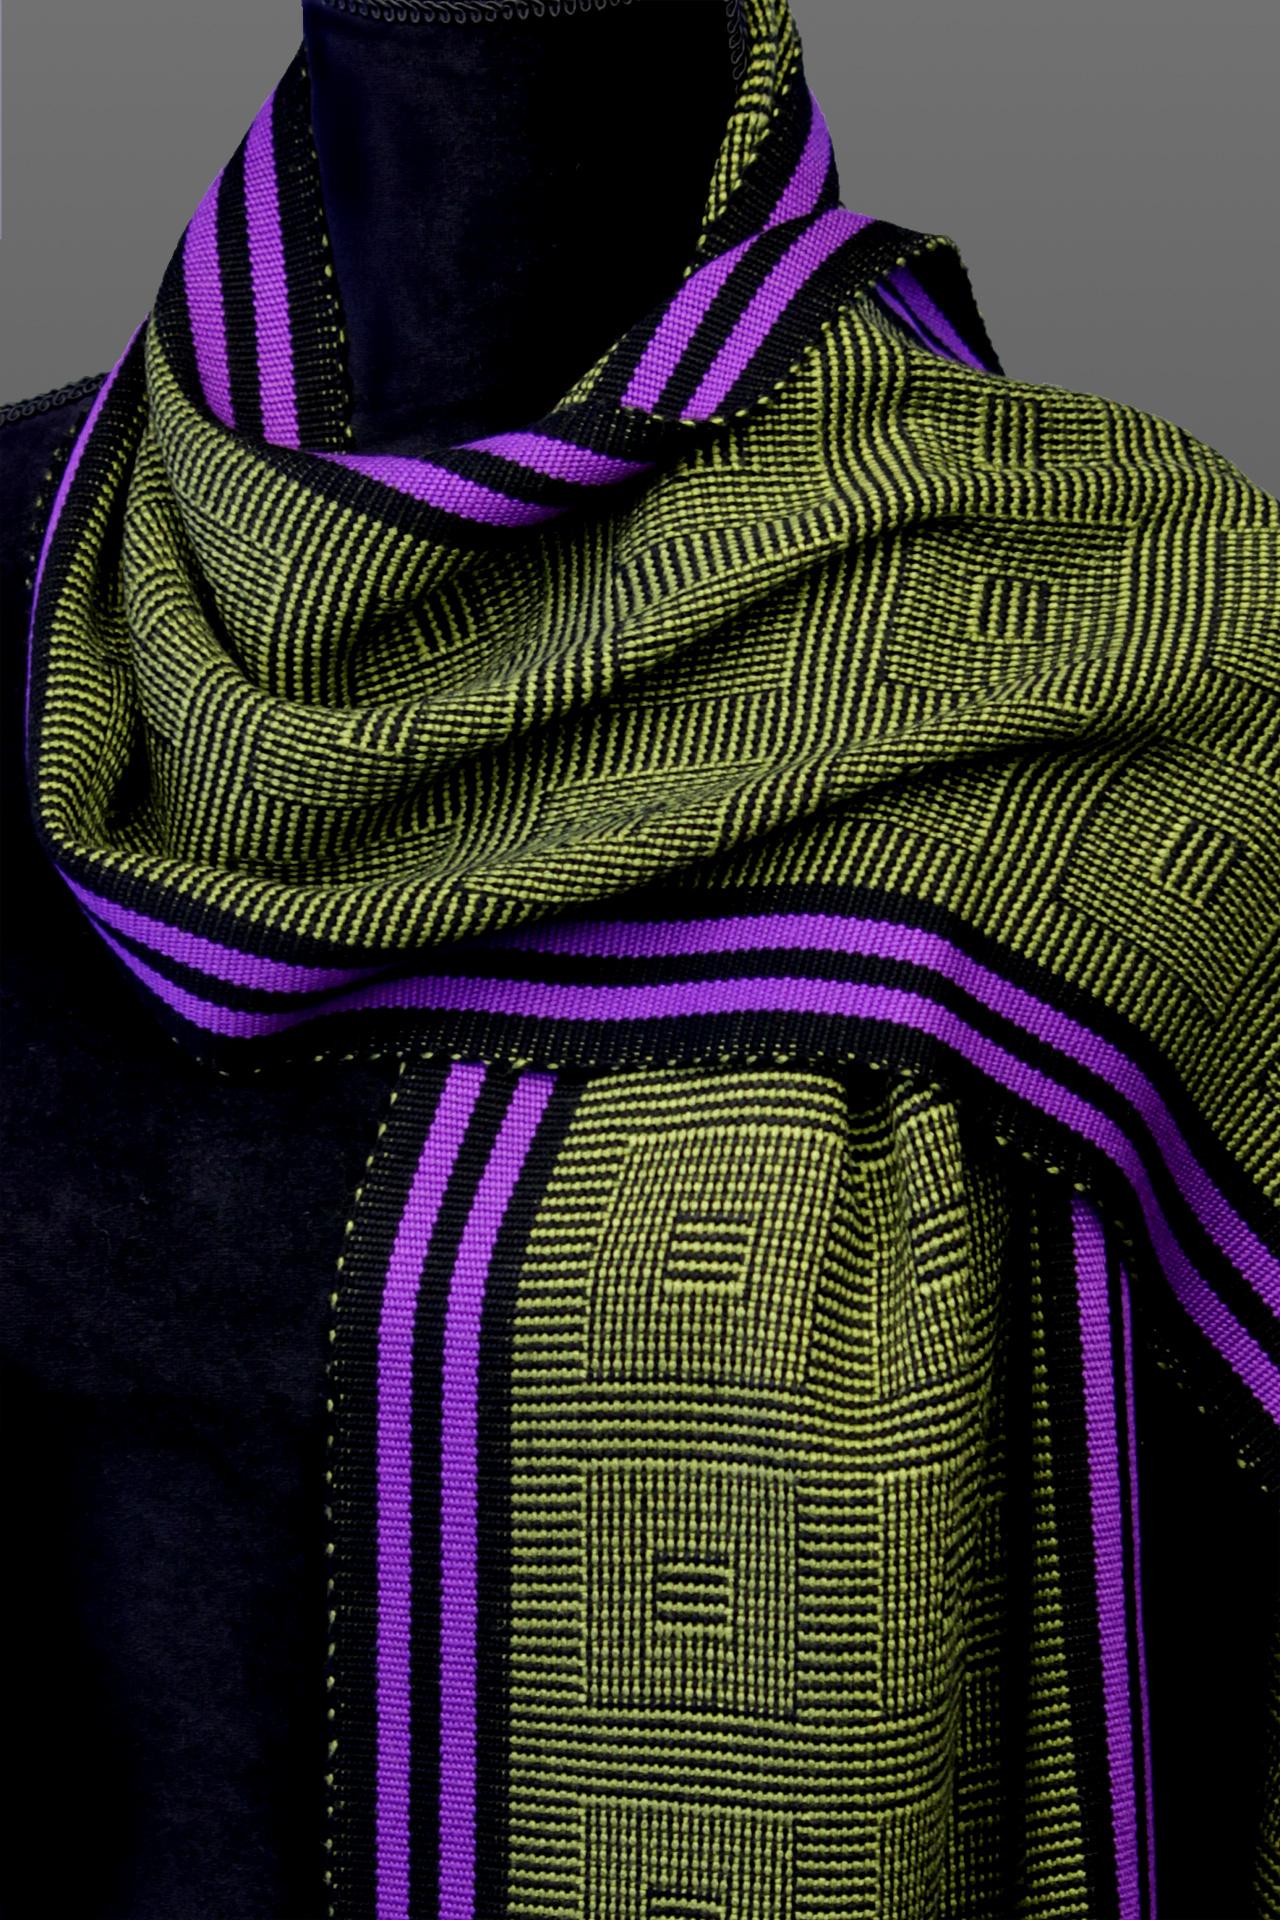 Square Squared X3 Green Tea Pansy_12 CU.jpg